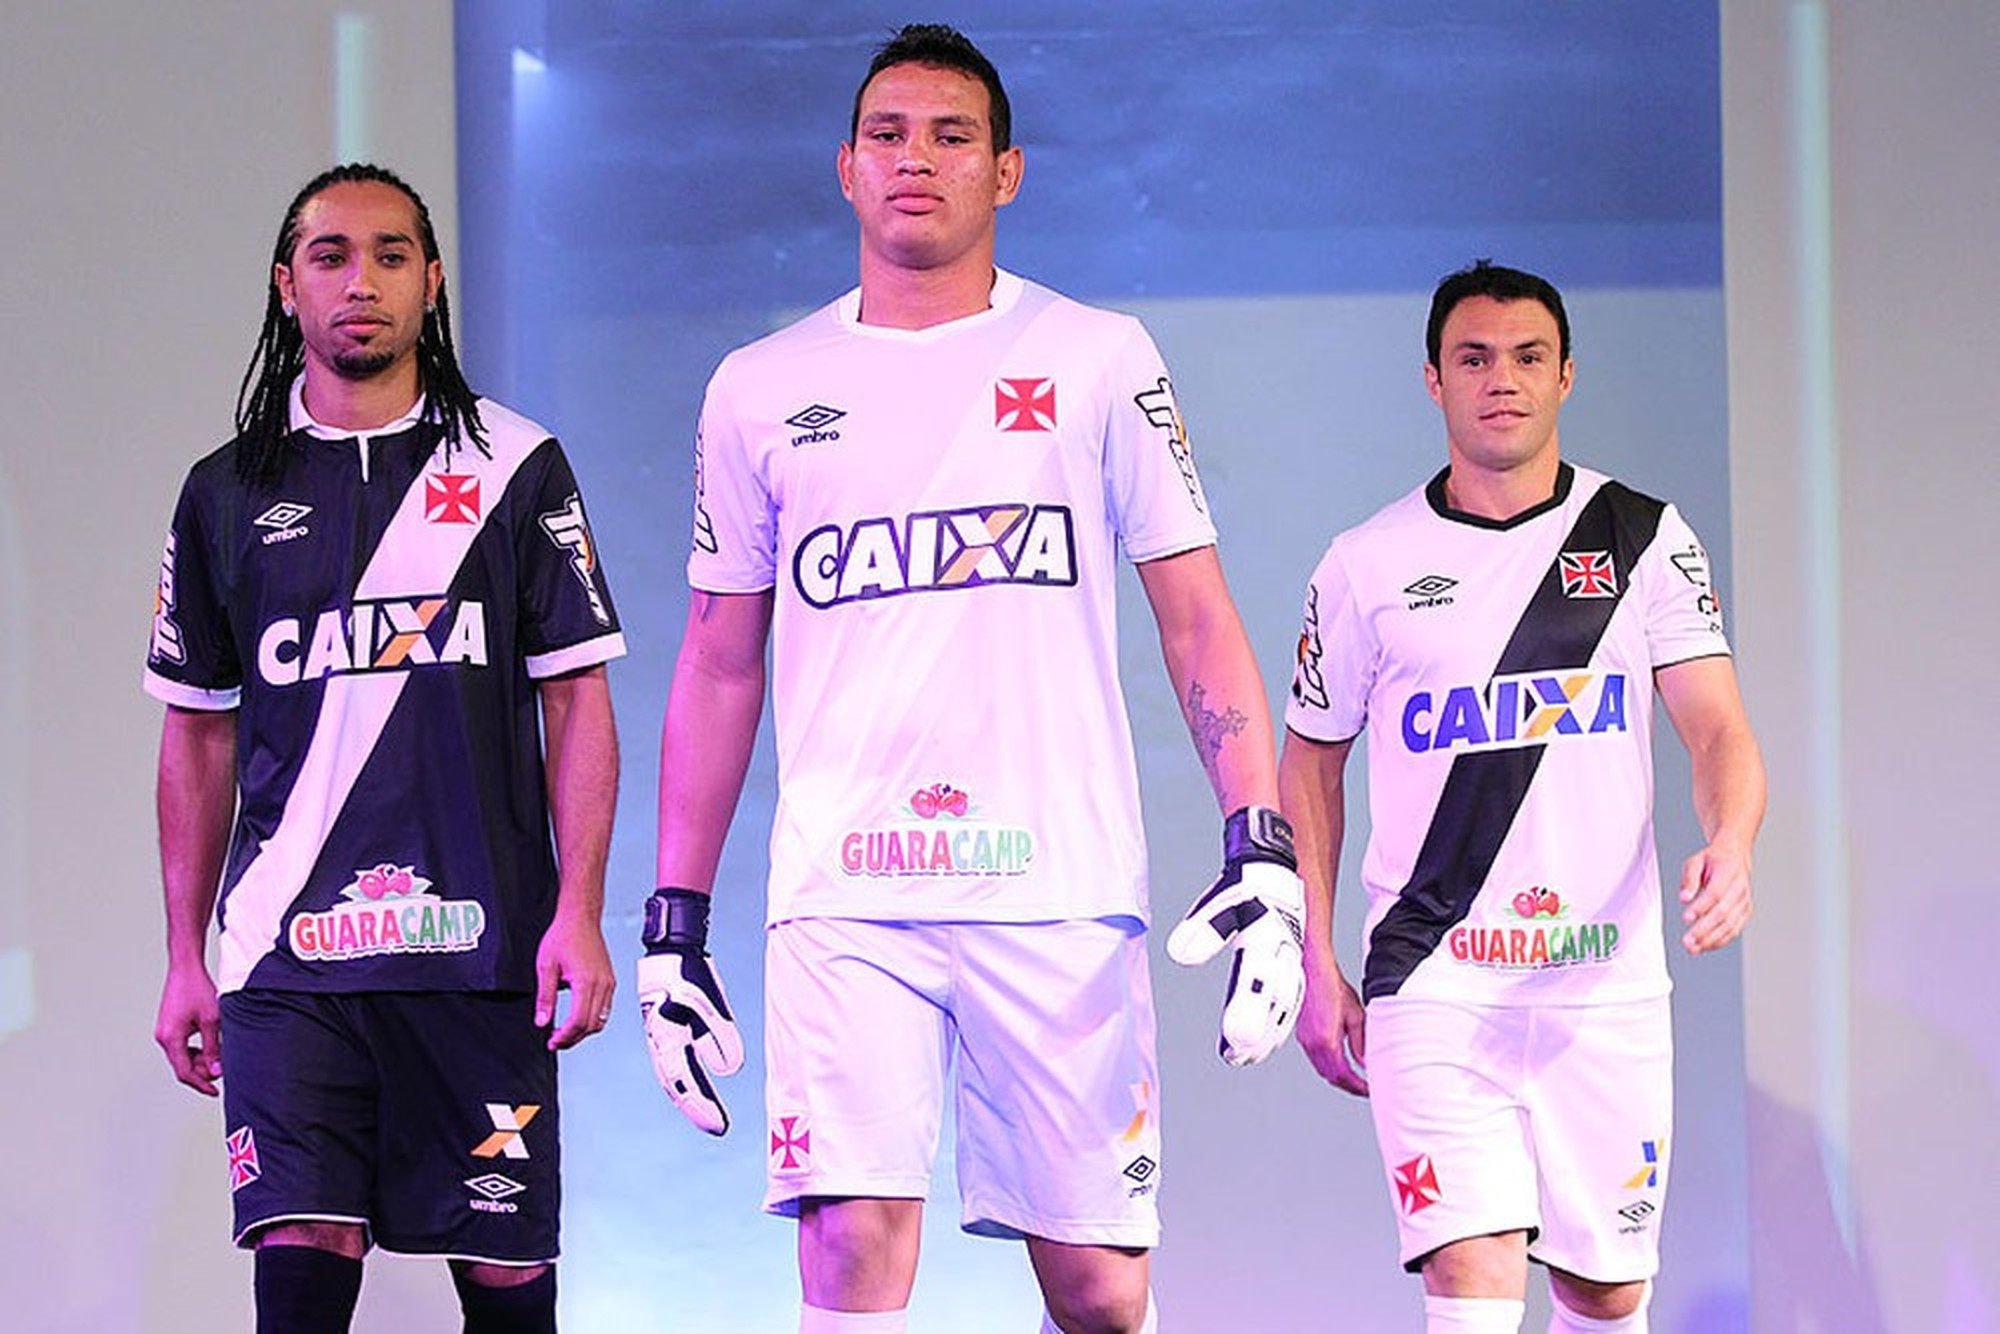 Caixa patrocinou o Vasco até o final de 2017